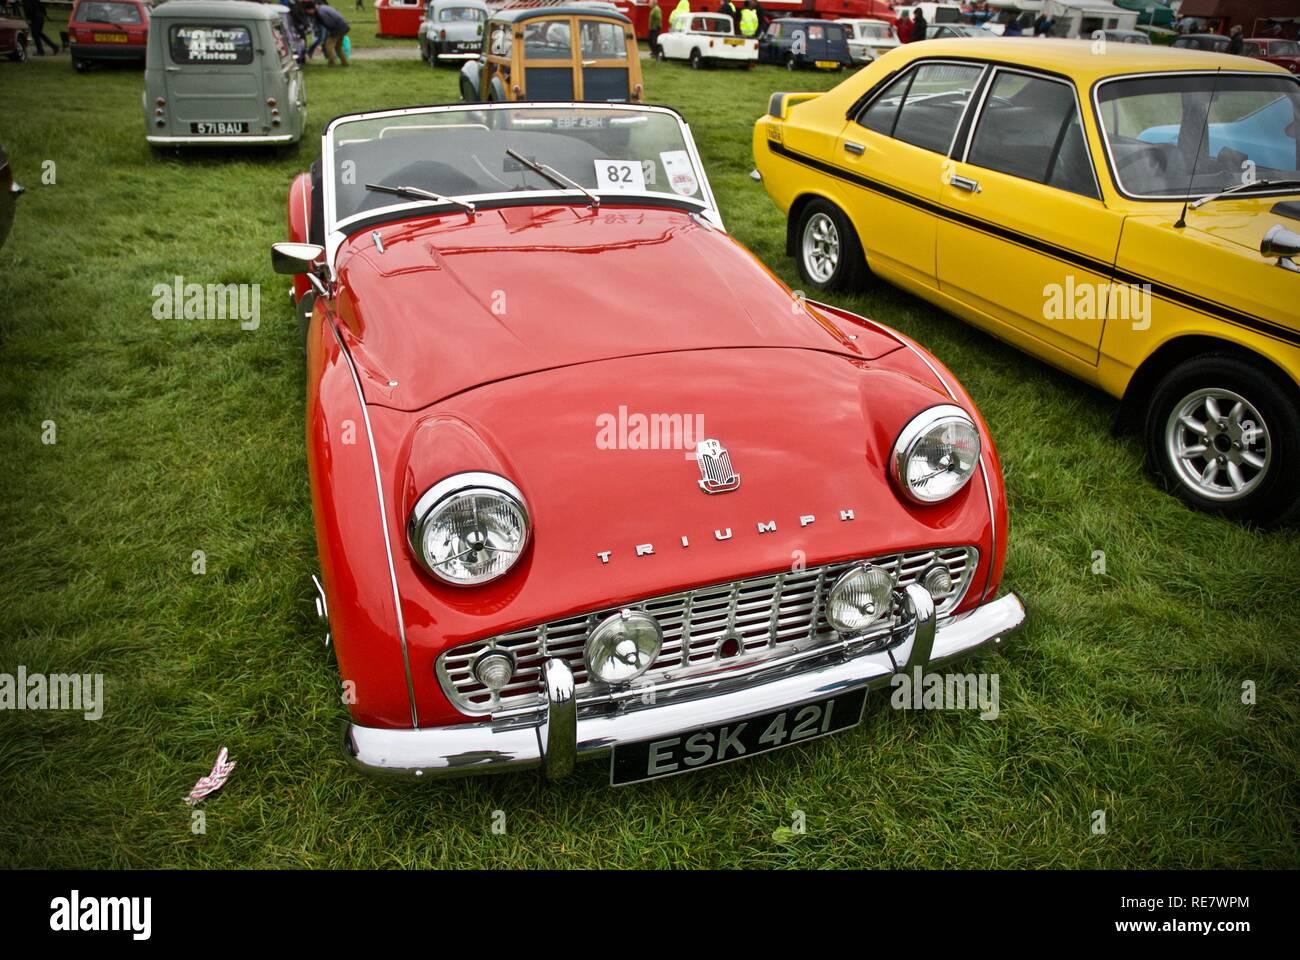 Triumph Motor Company Stock Photos & Triumph Motor Company